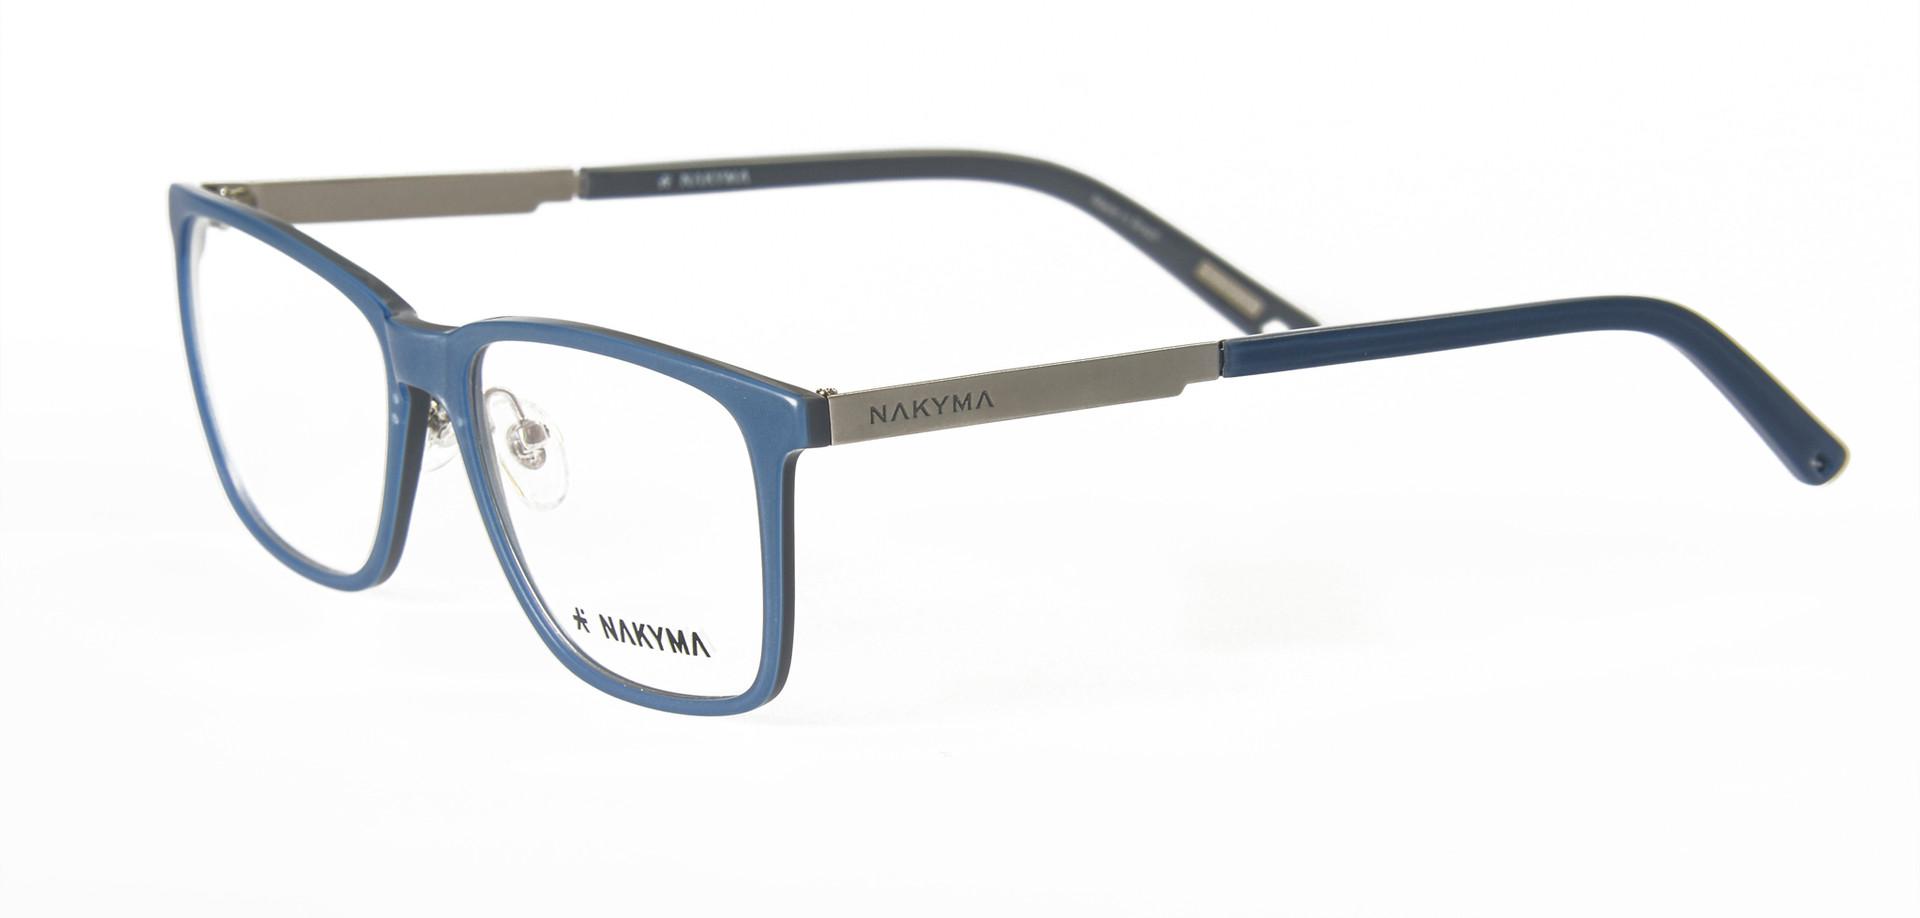 8R1-NAKYMA-02 C3